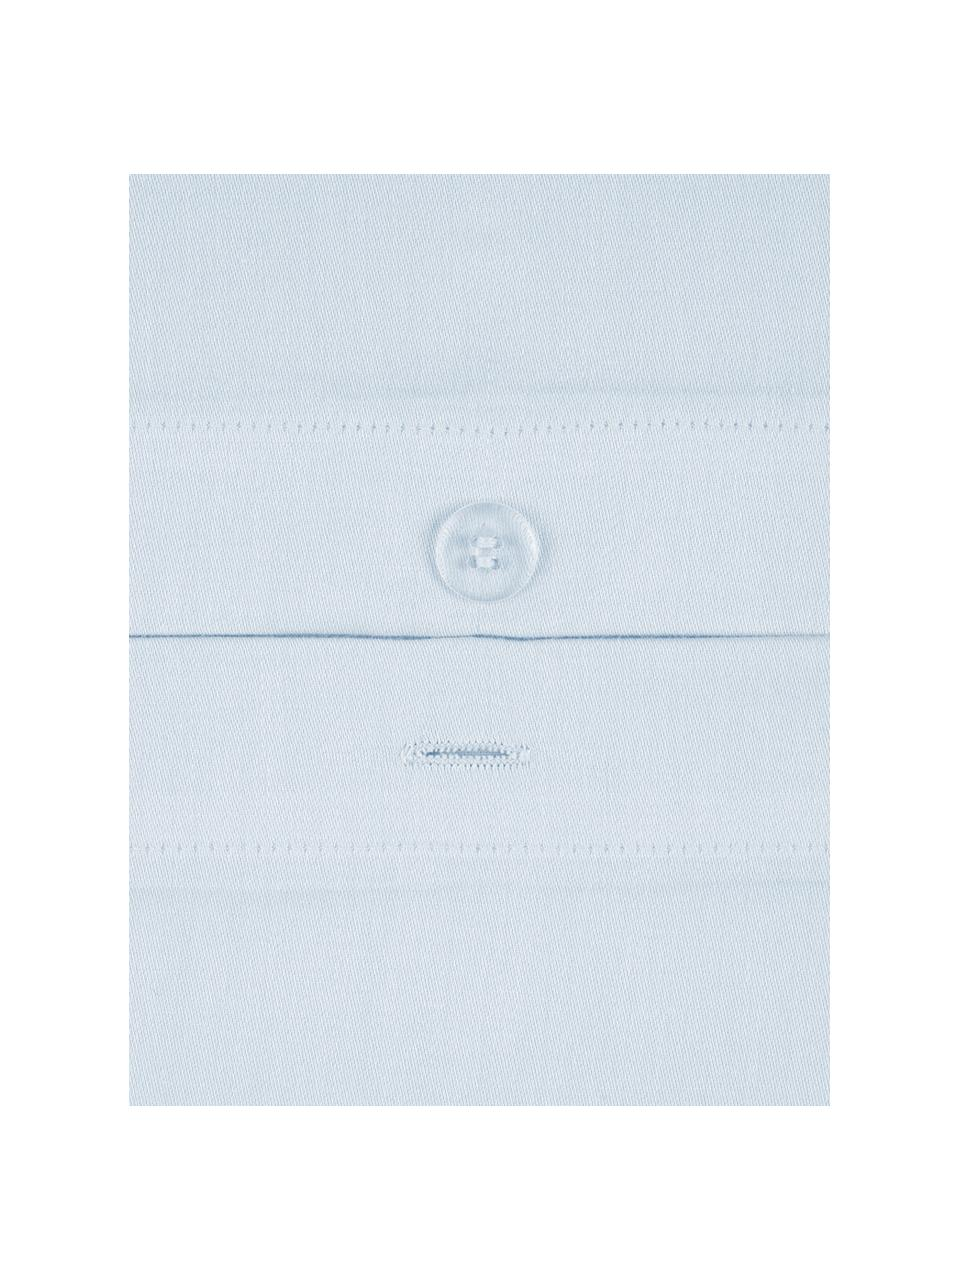 Baumwollsatin-Kopfkissenbezüge Comfort in Hellblau, 2 Stück, Webart: Satin Fadendichte 250 TC,, Hellblau, 40 x 80 cm